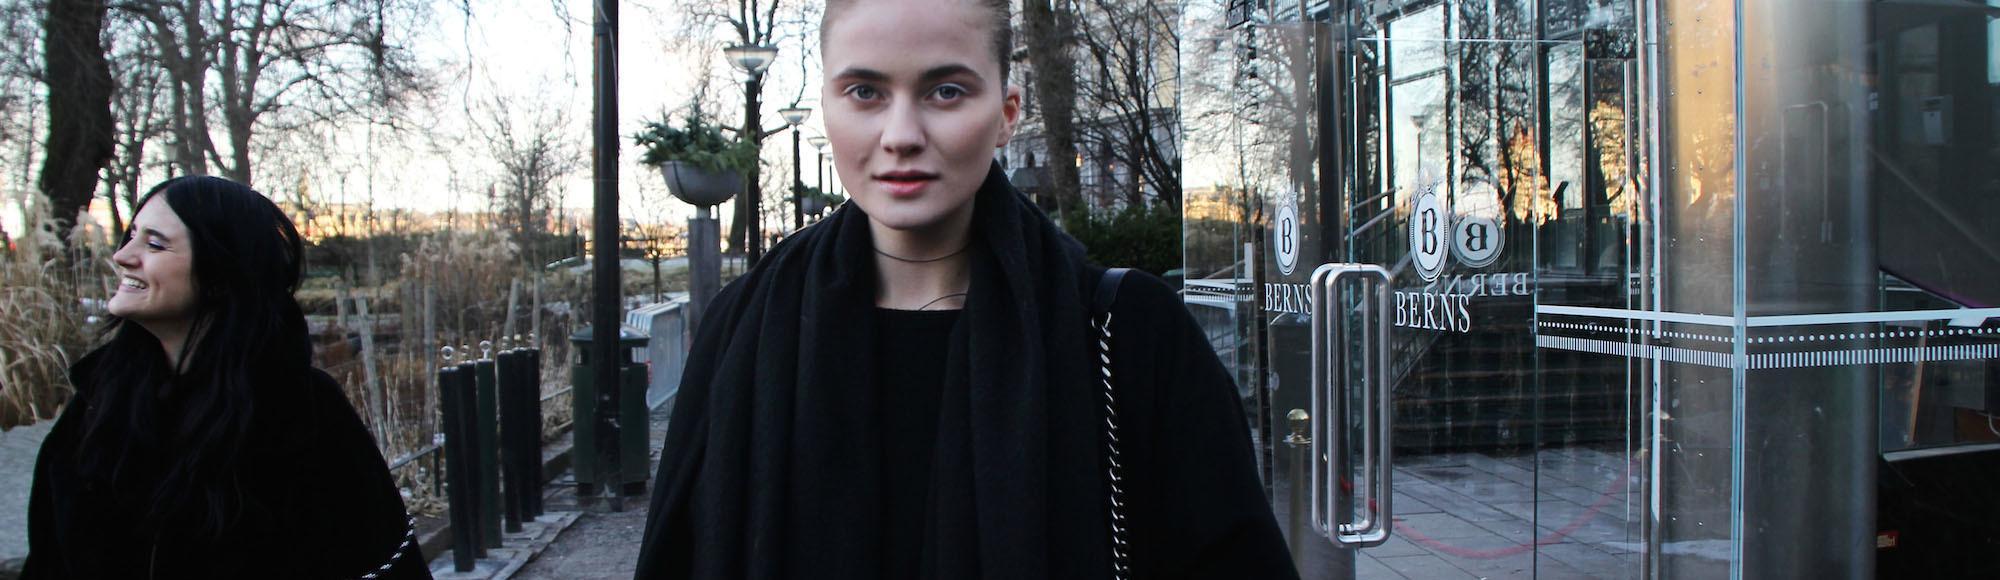 Why Do Swedish People Always Wear Black?